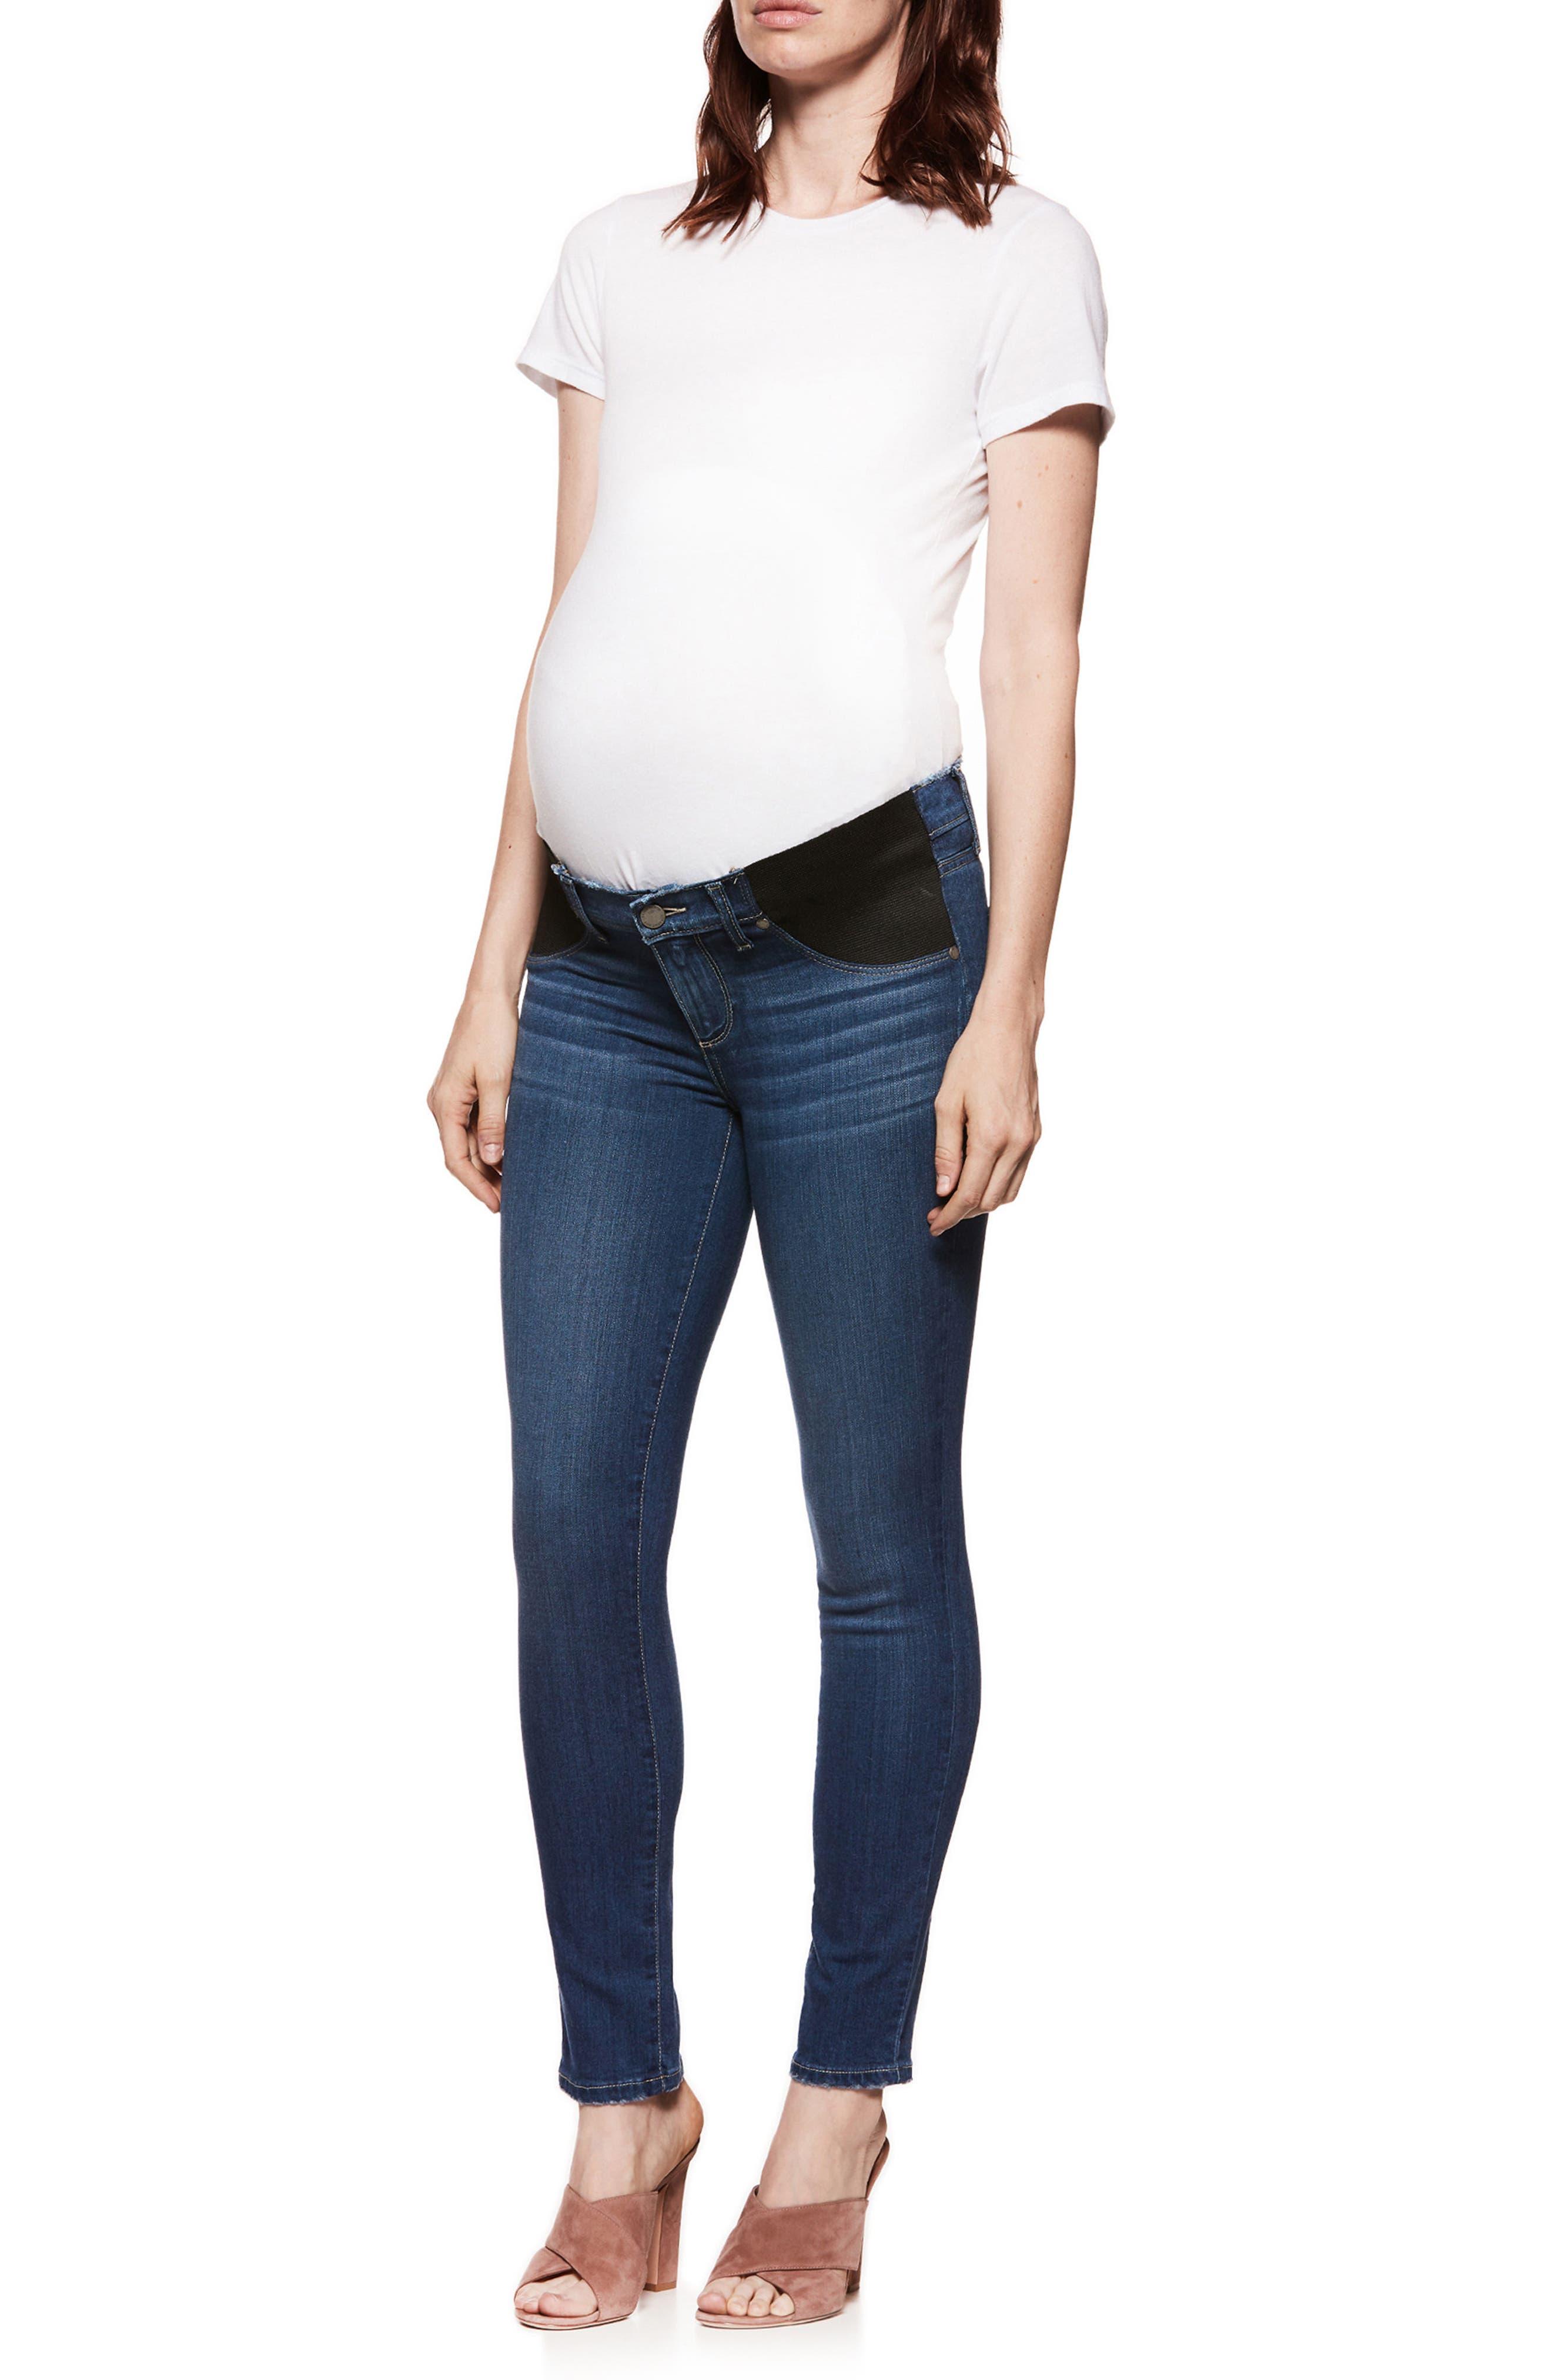 PAIGE,                             Transcend - Verdugo Ultra Skinny Maternity Jeans,                             Alternate thumbnail 3, color,                             400